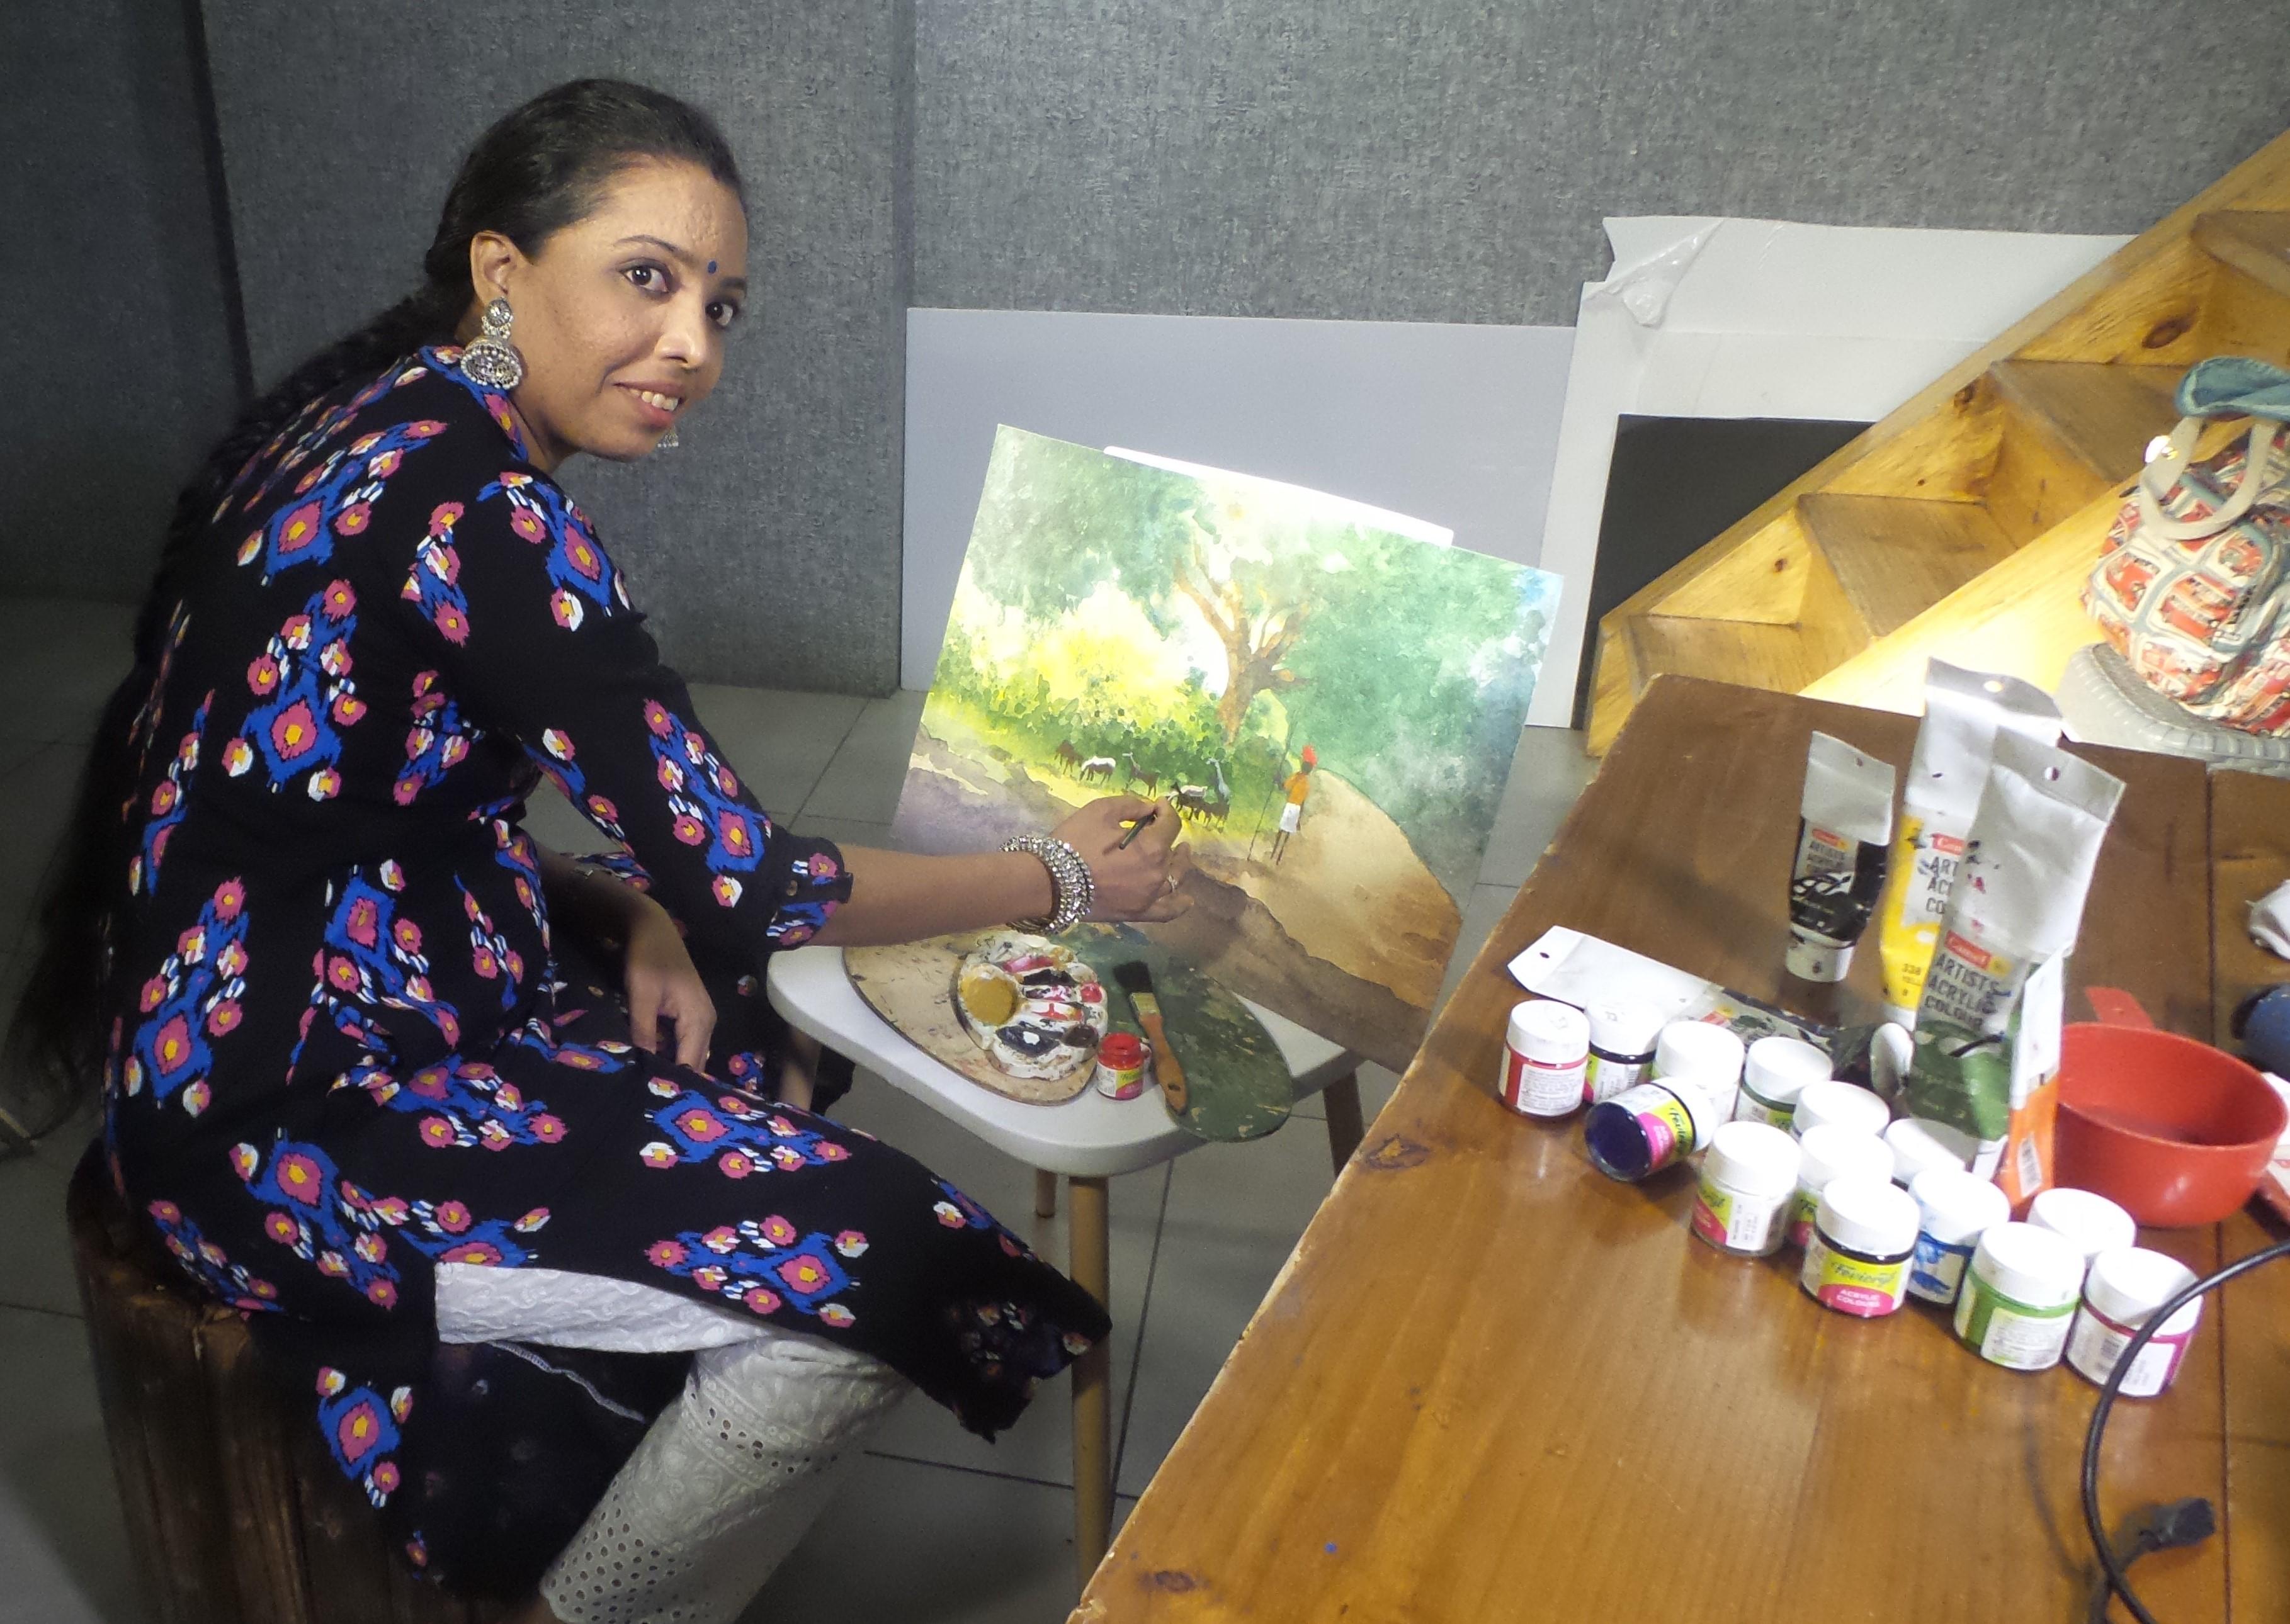 Swapnali Satyawan Patade